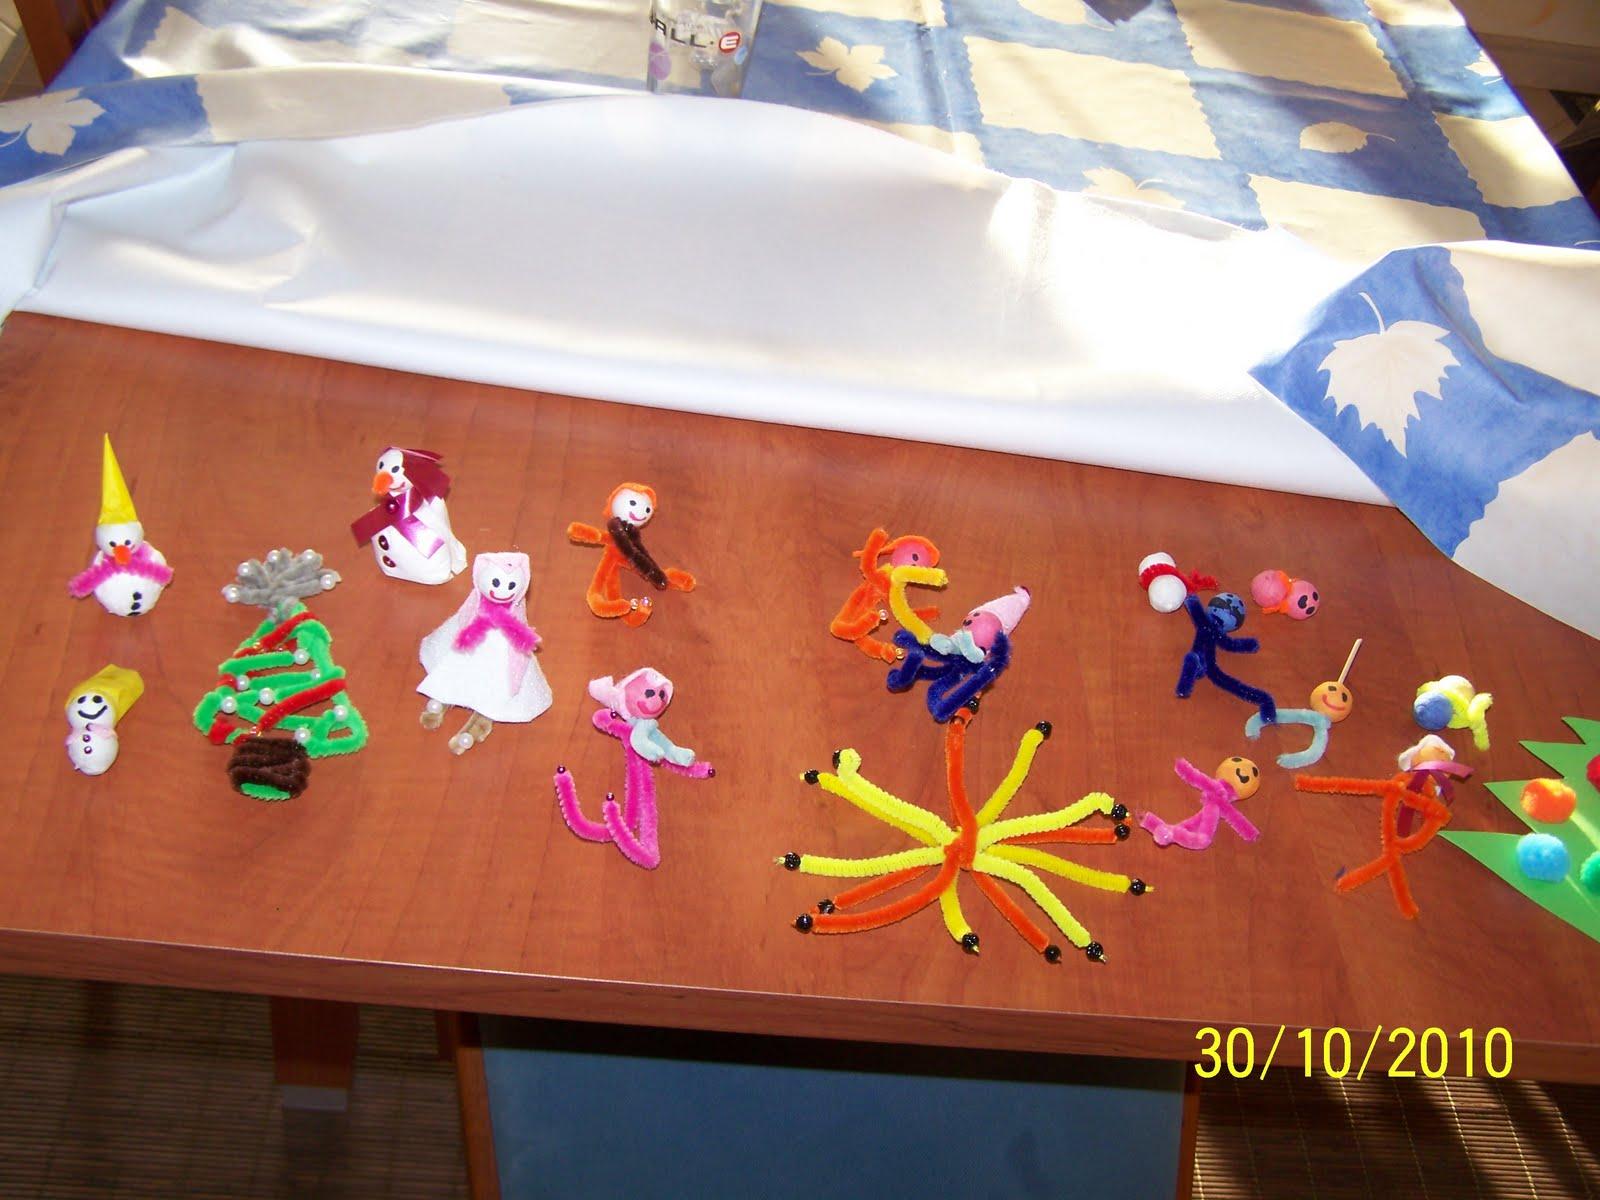 Mes idees de sorties sympa bricolage de noel avec les enfants - Bricolage enfant noel ...